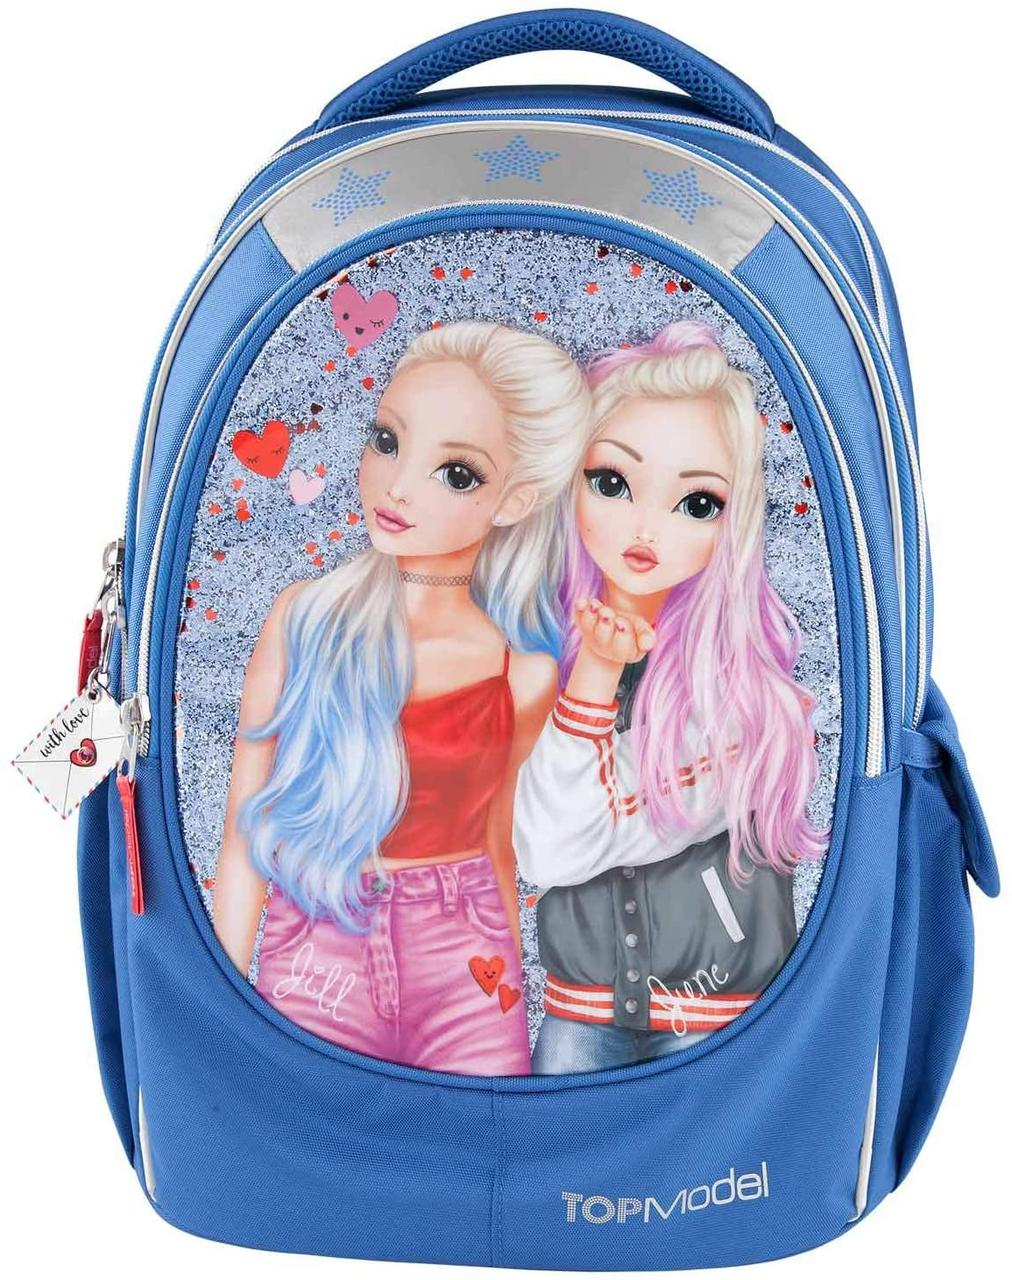 Top-Model Depesche Шкільний рюкзак Top Model Friends June & Jill синій (Школьный портфель Топ Модел Друзья)